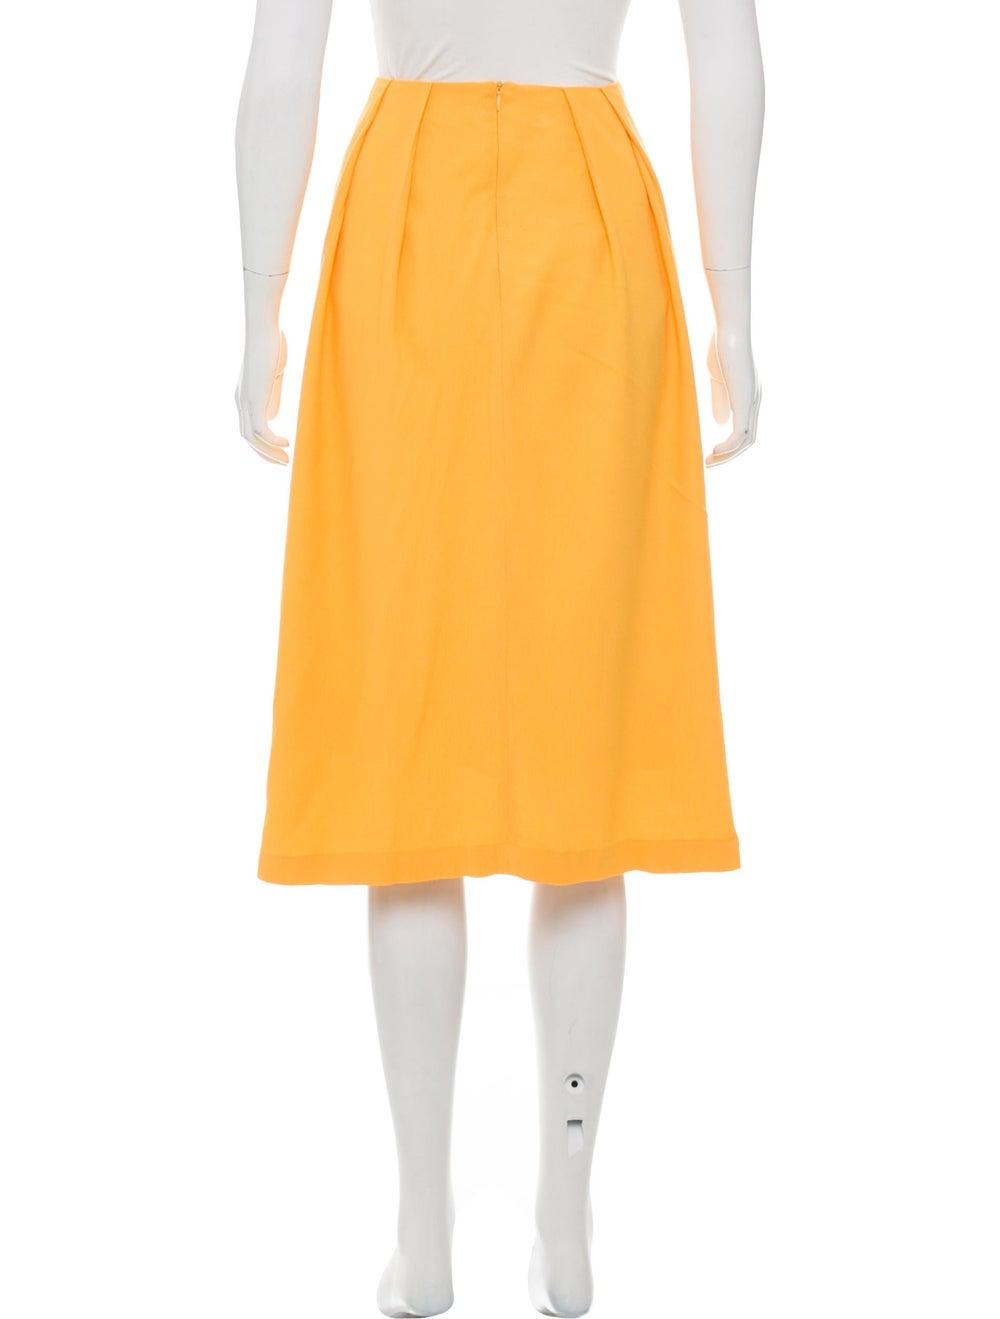 Marimekko Pleated Knee-Length Skirt Yellow - image 3